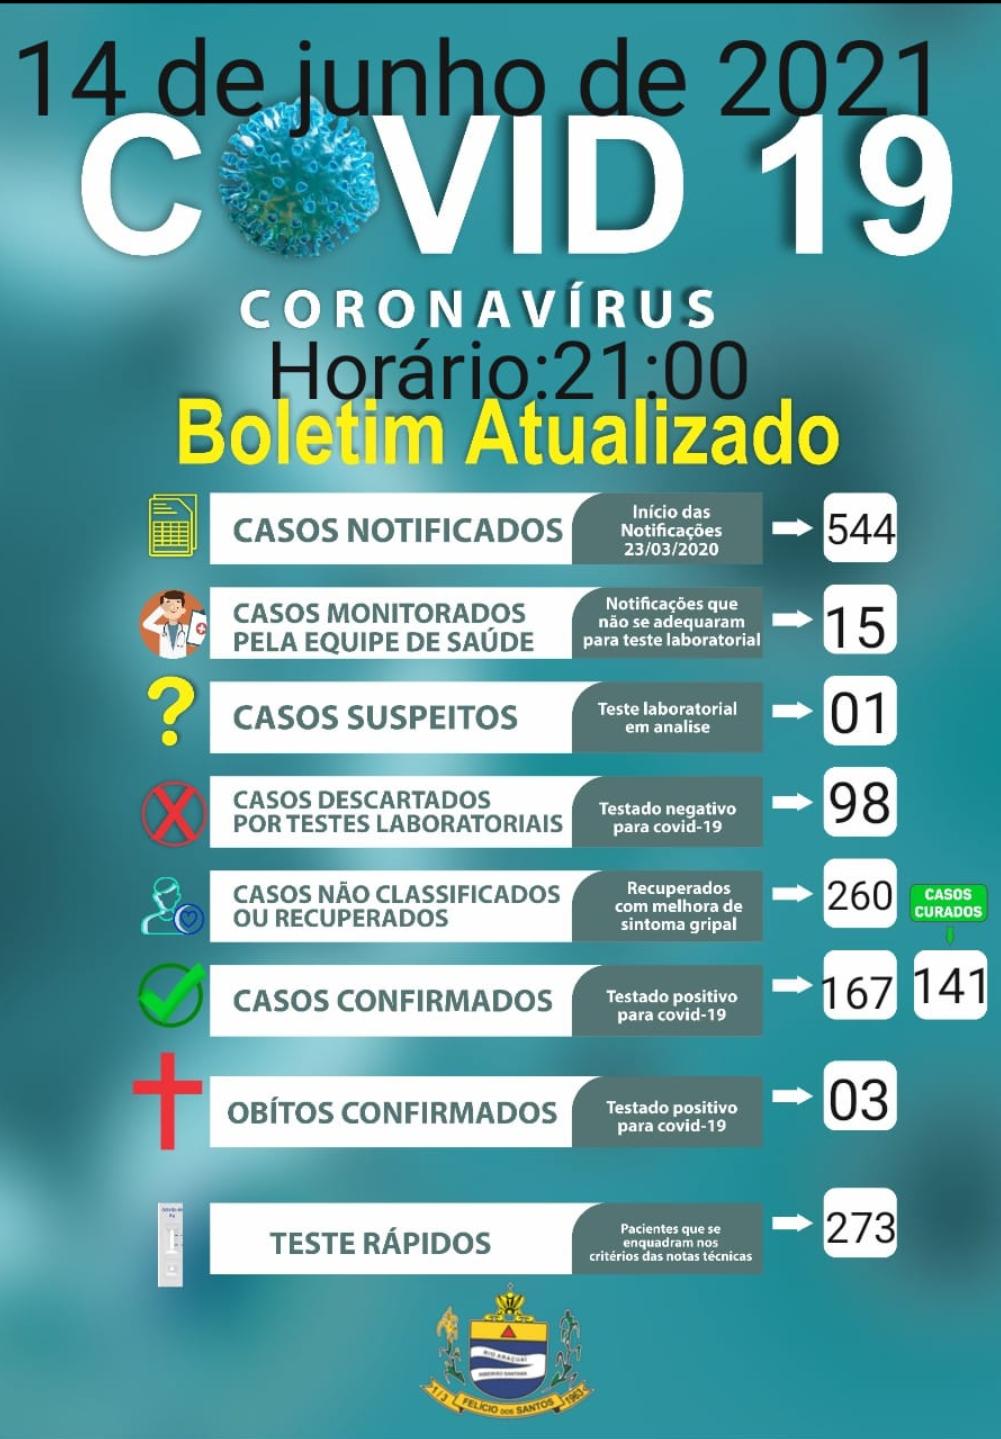 Boletim covid-19,14 de junho de 2021